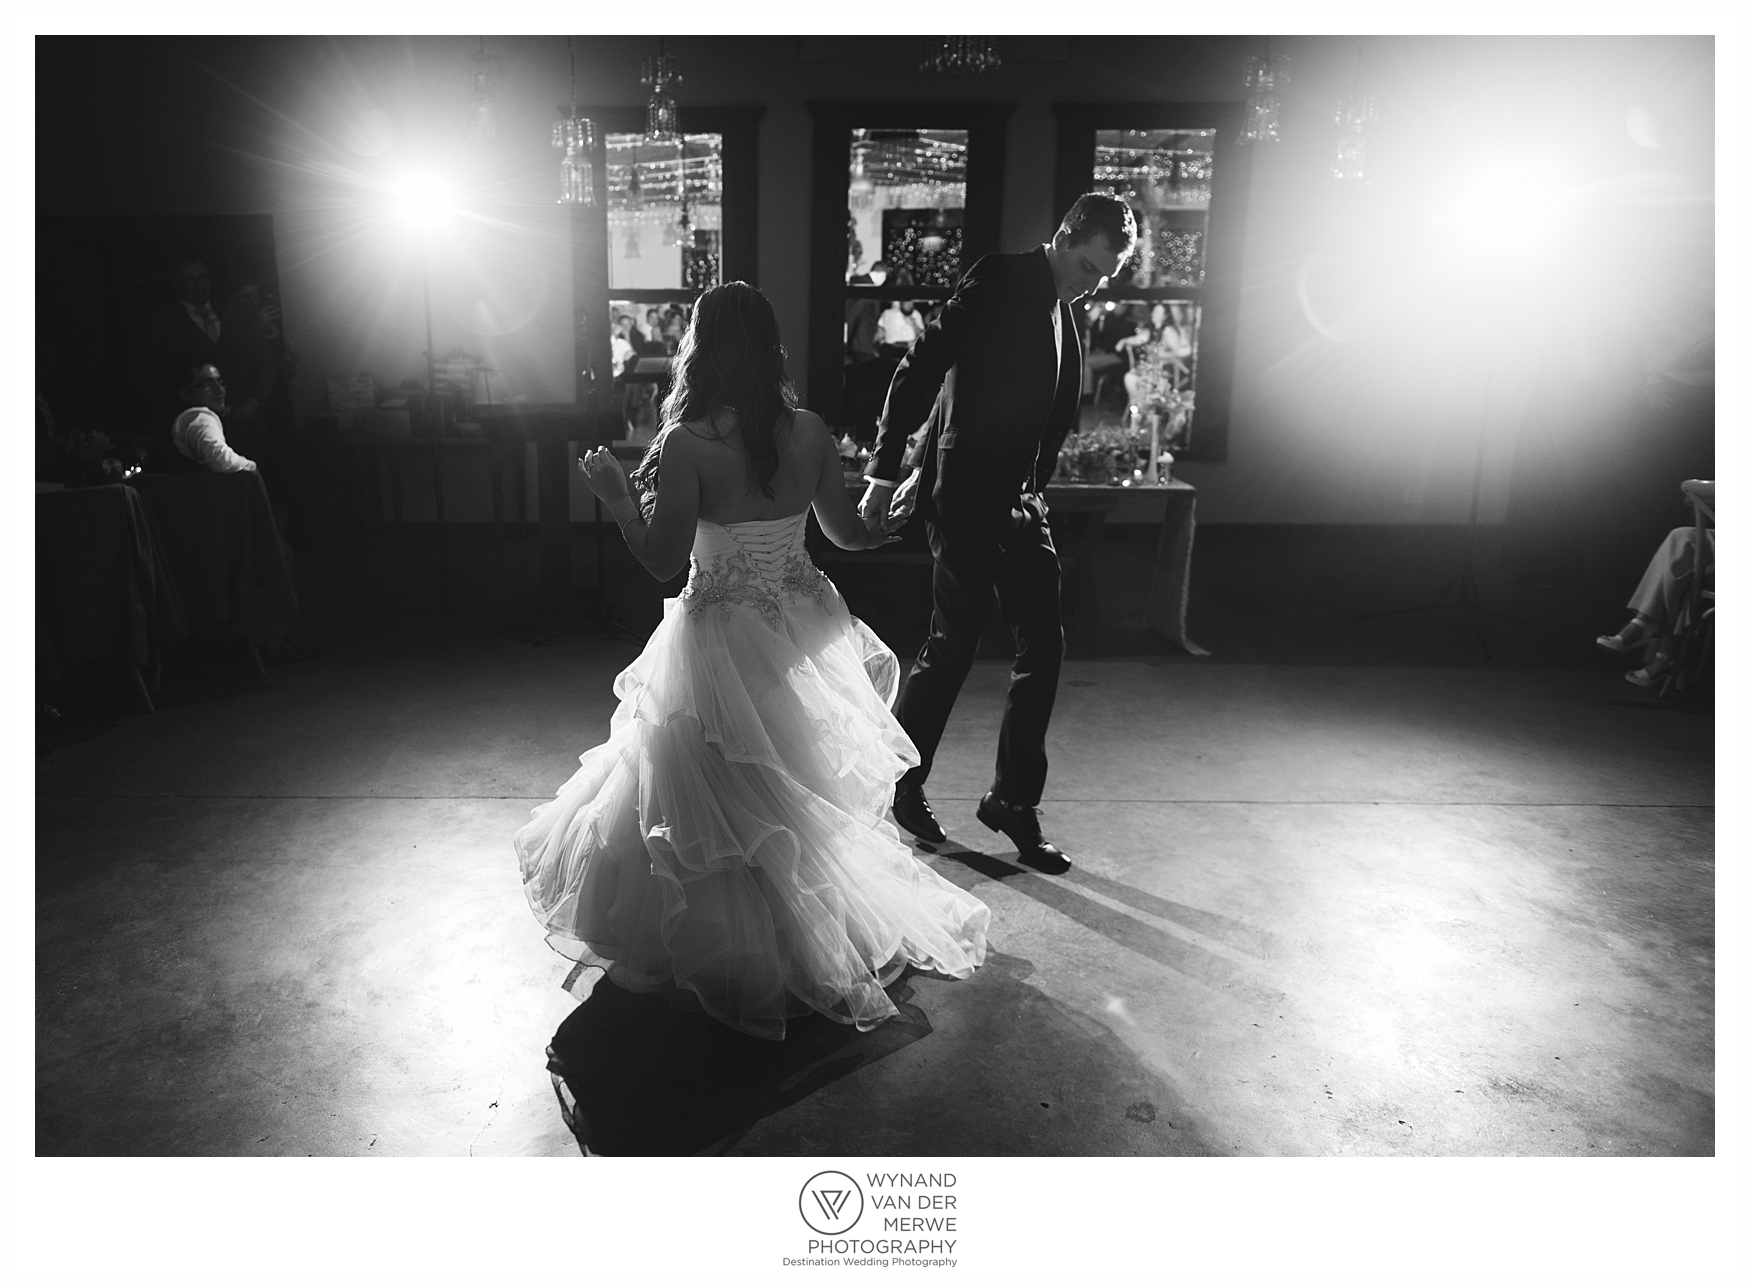 Wynandvandermerwe ryan natalia wedding photography cradle valley guesthouse gauteng-690.jpg